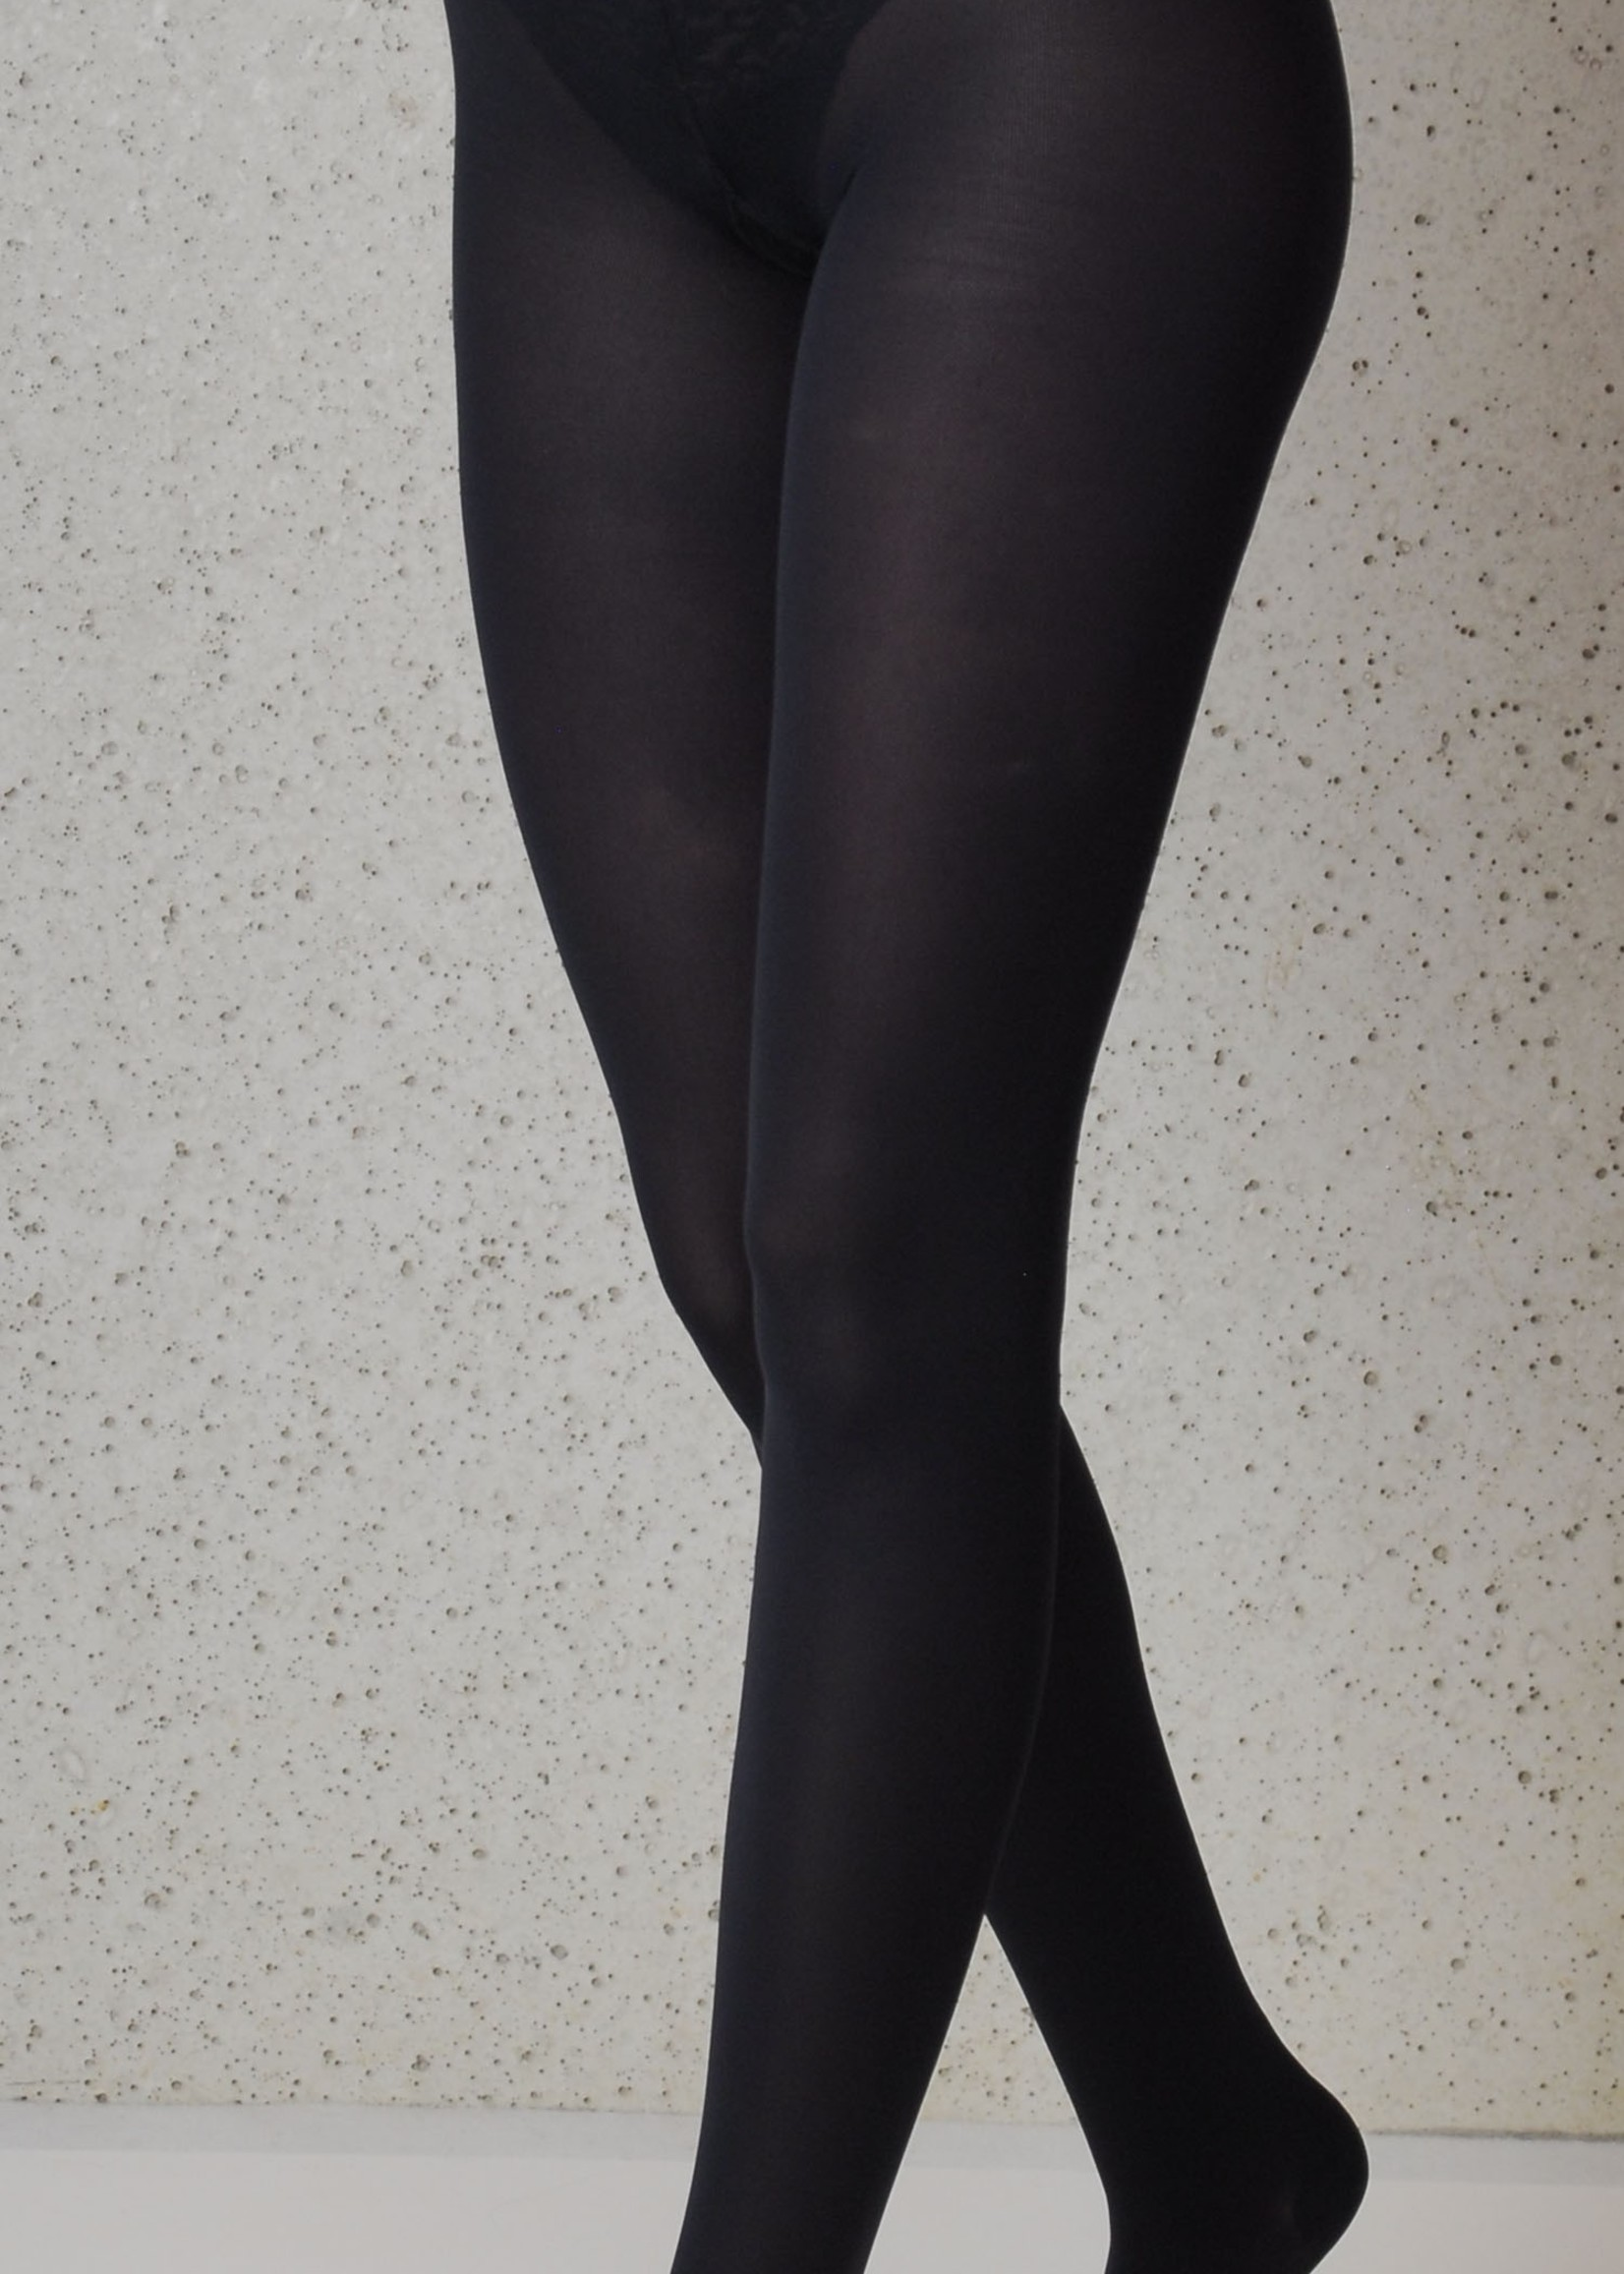 Segretta Segretta Young Coprente 70 Matte Opaque Panty met medium compressie - Blue